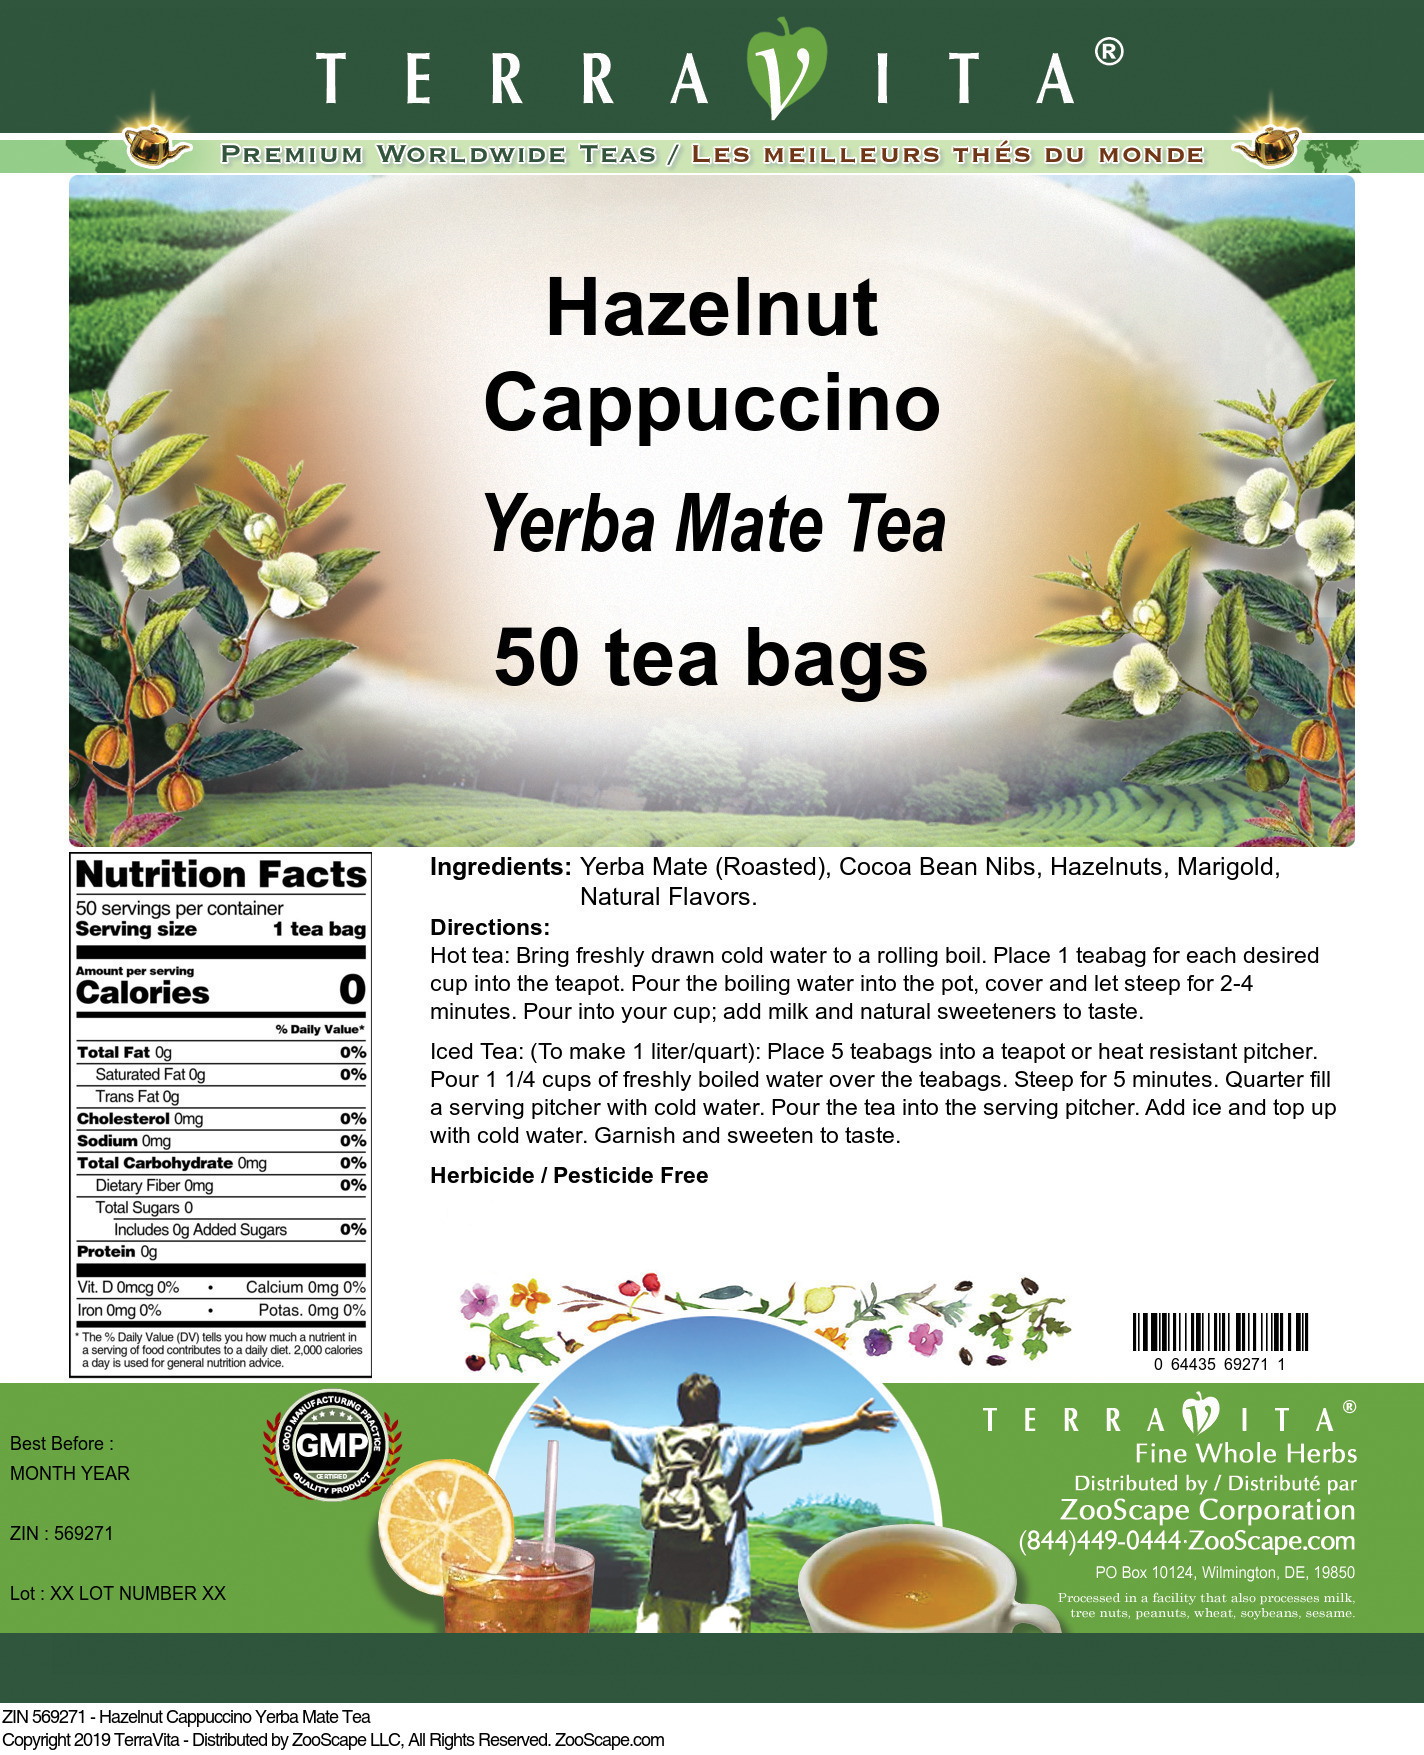 Hazelnut Cappuccino Yerba Mate Tea